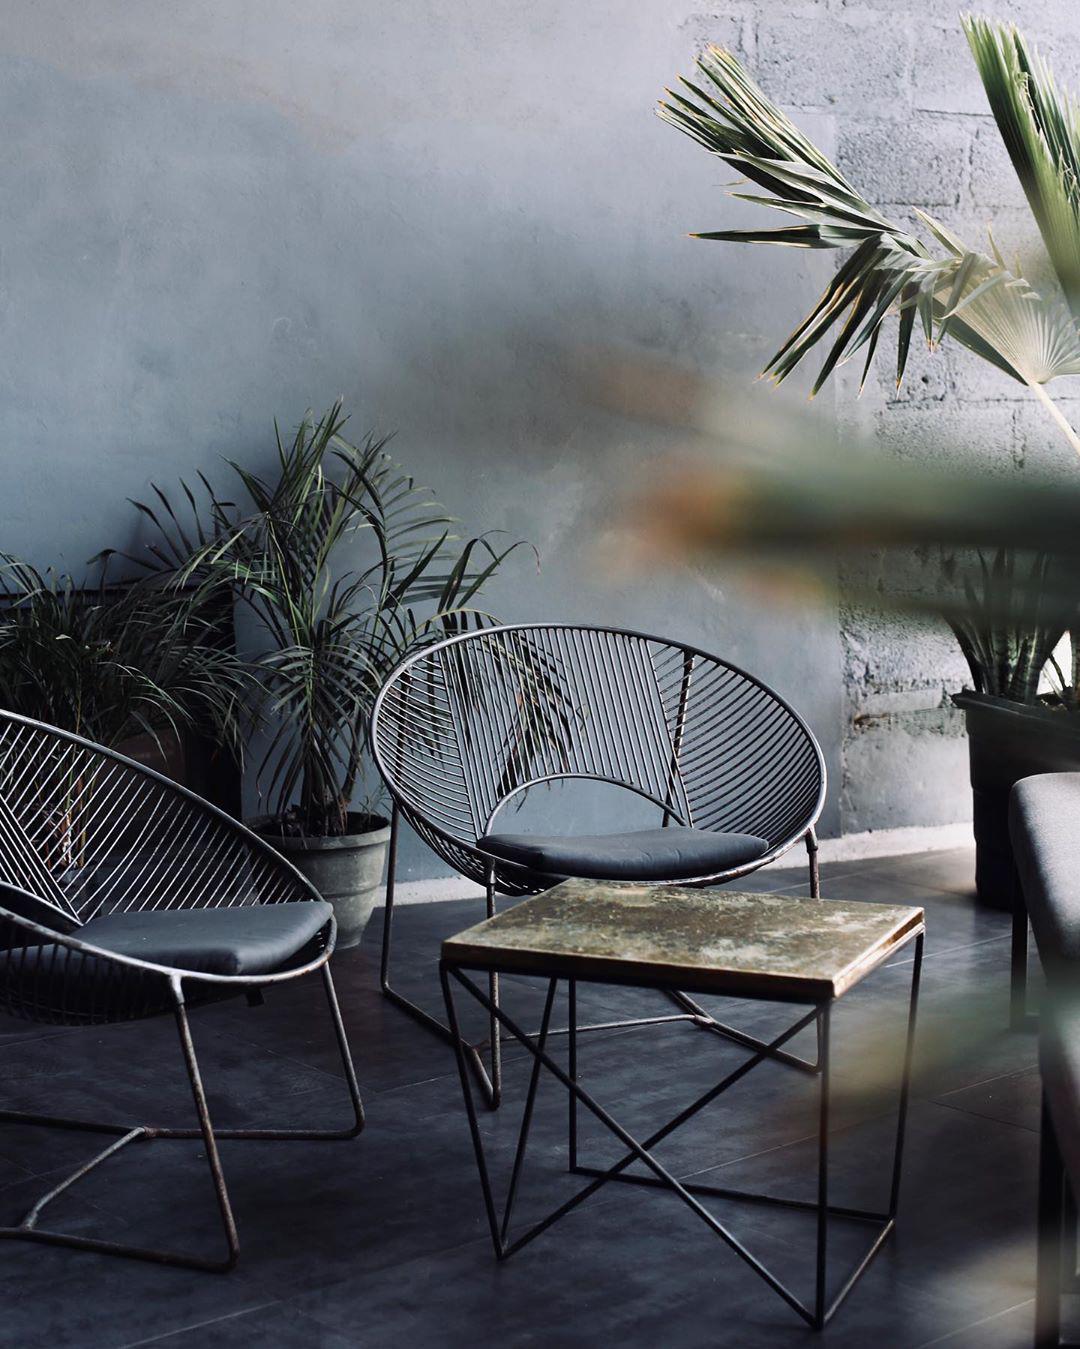 logan-rustica-terraza-sillas